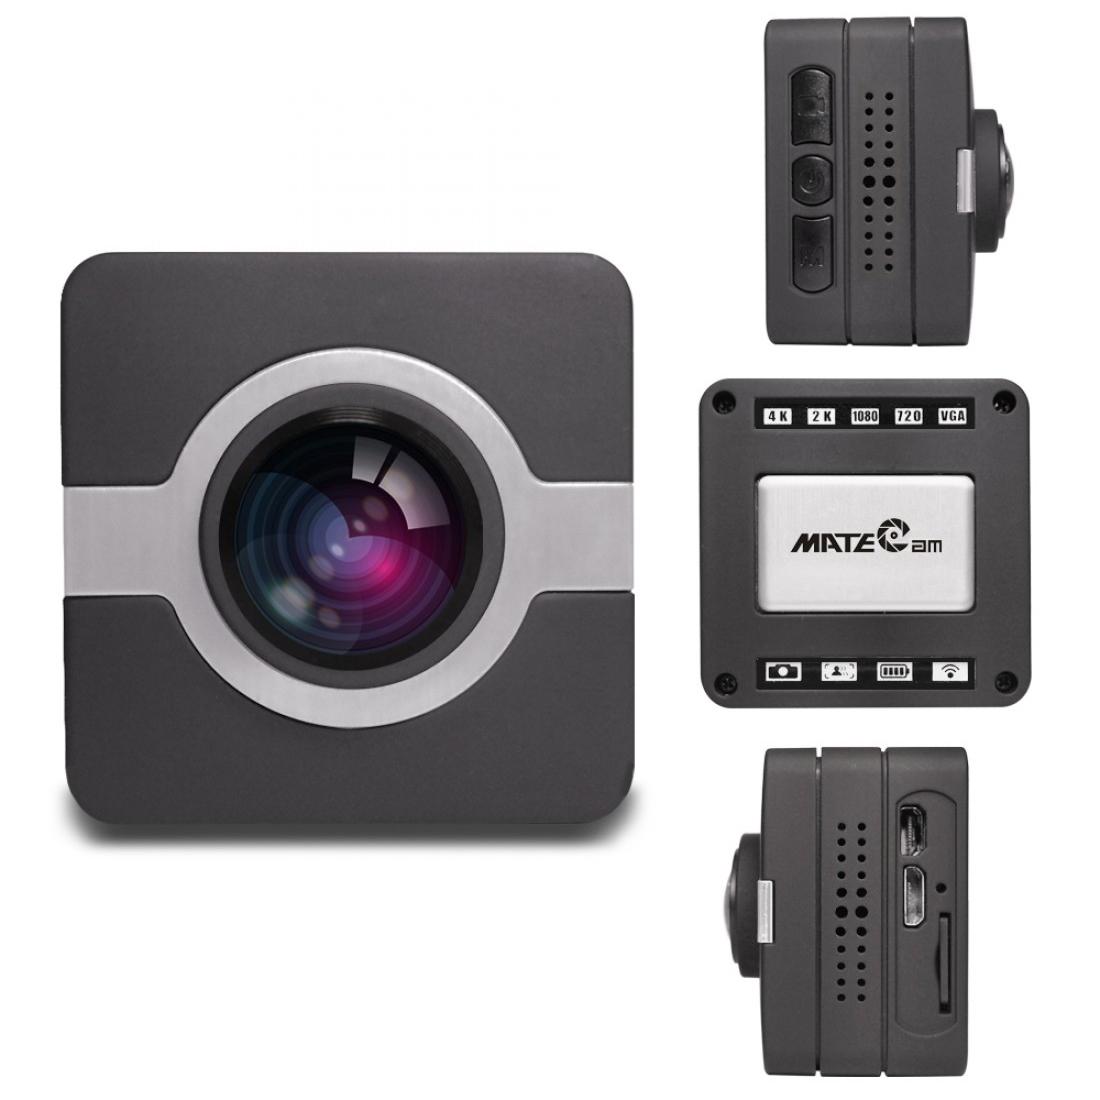 Matecam X1 Car Dashboard Camera Cam recorder WIFI Sports Action Camera 4K-HI Ultra HD Waterproof DV Camcorder 16MP 160 Degree Wide Angle WIFIG-SensorGyro StabilizationMotion DetectionRemote control RC cam Bike Helmet Cam  ( (5)